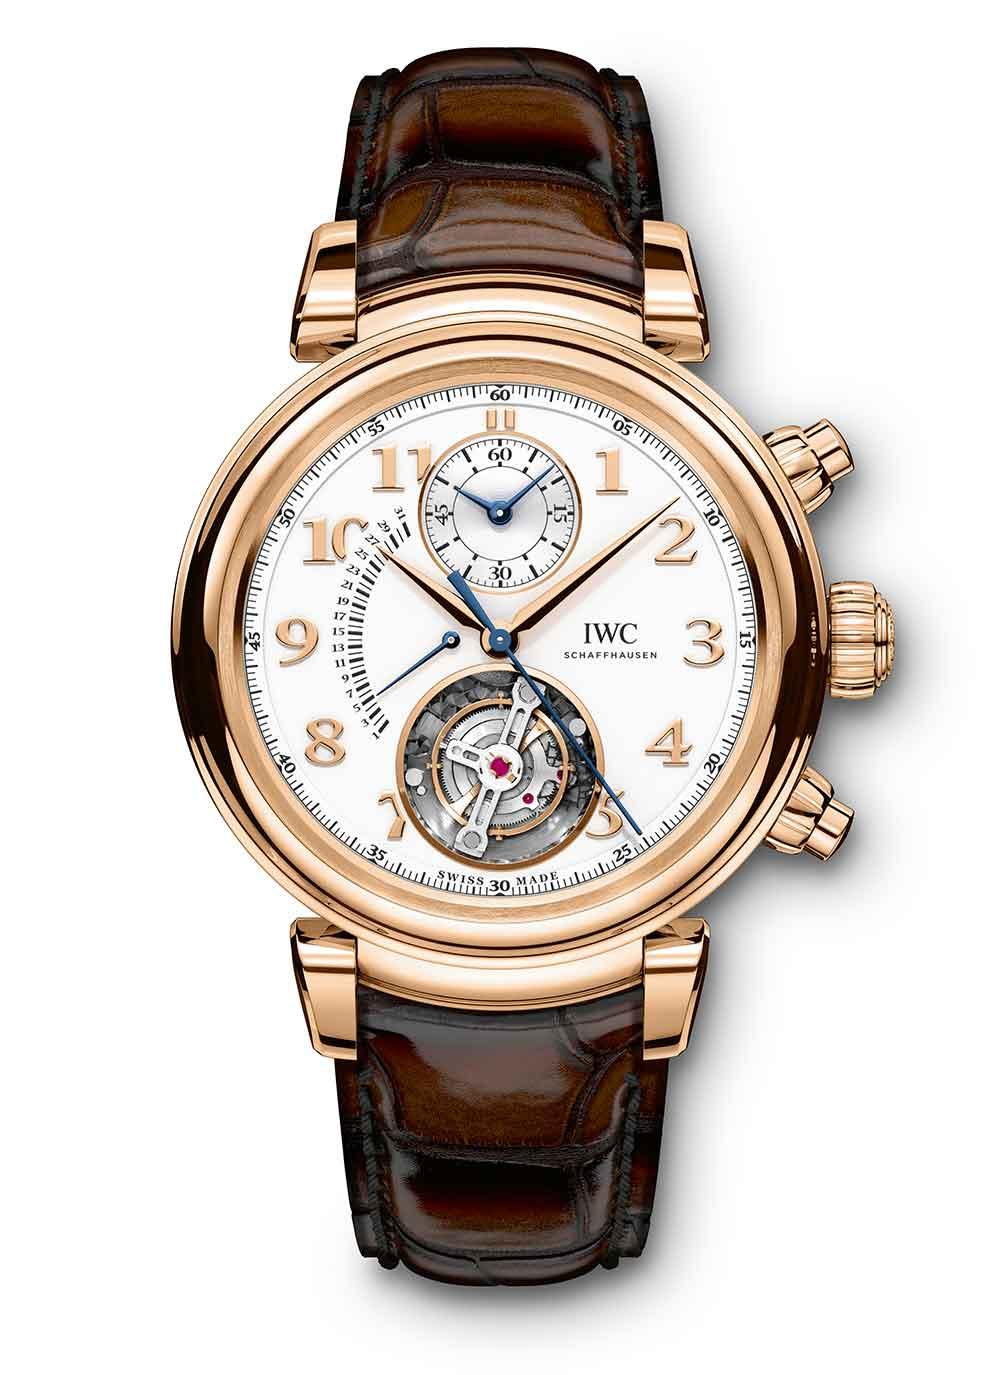 IWC Da Vinci Tourbillon Rétrograde Chronograph, reference IW393101